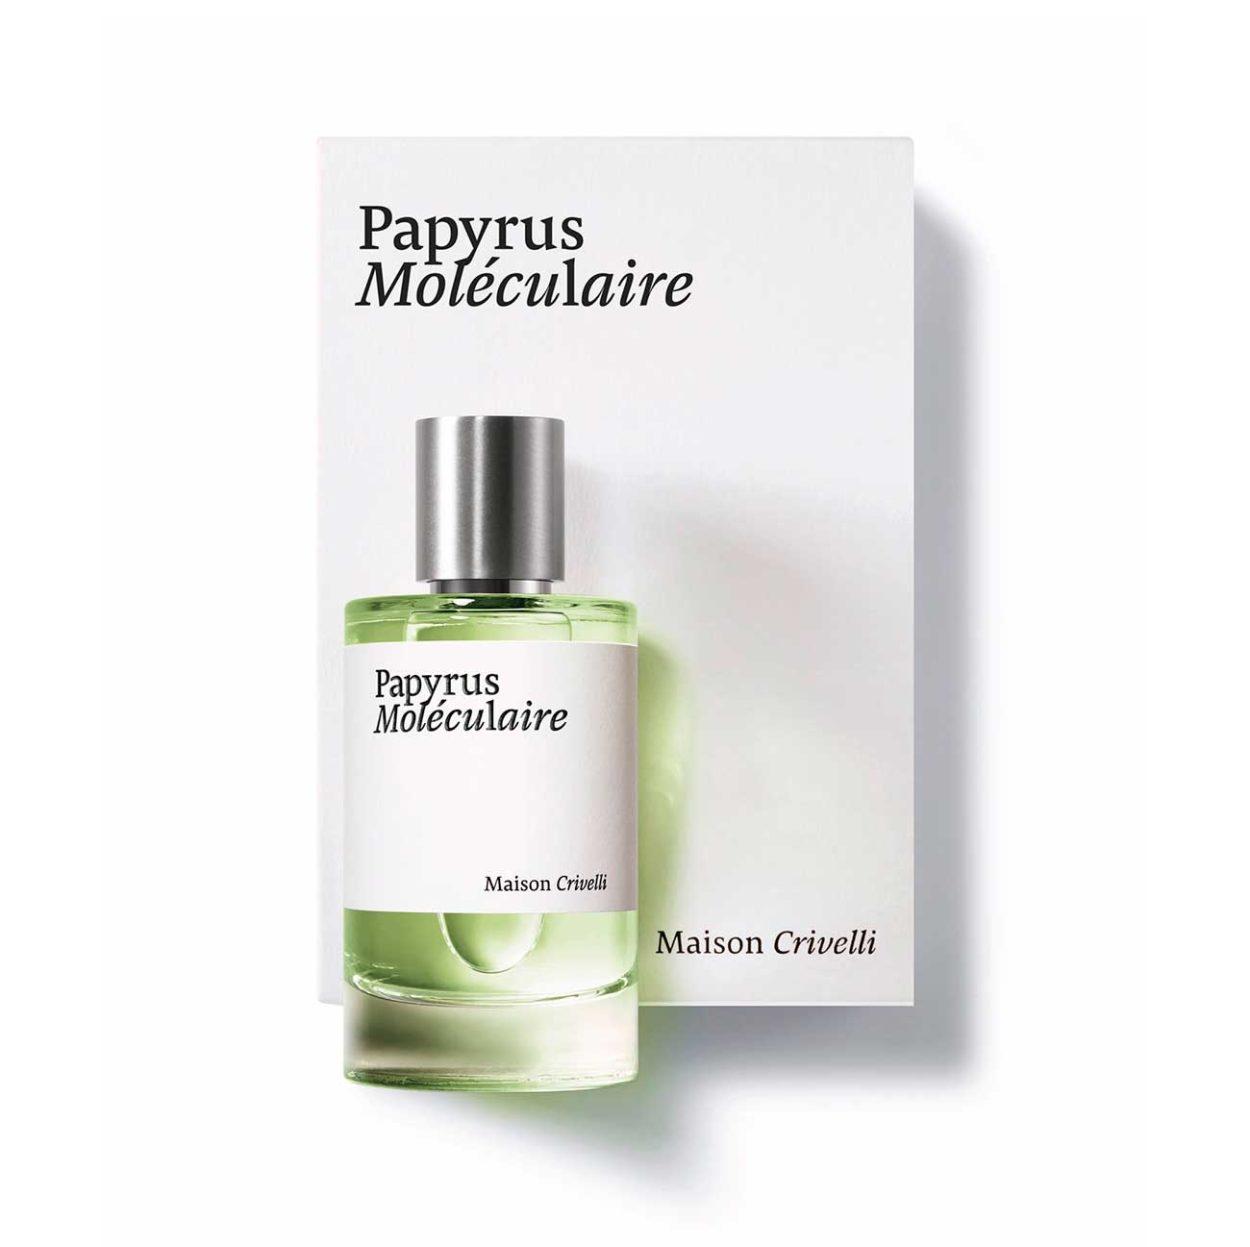 Papyrus Moléculaire 100ml niche perfume papyrus sandalwood tonka iris- maison crivelli